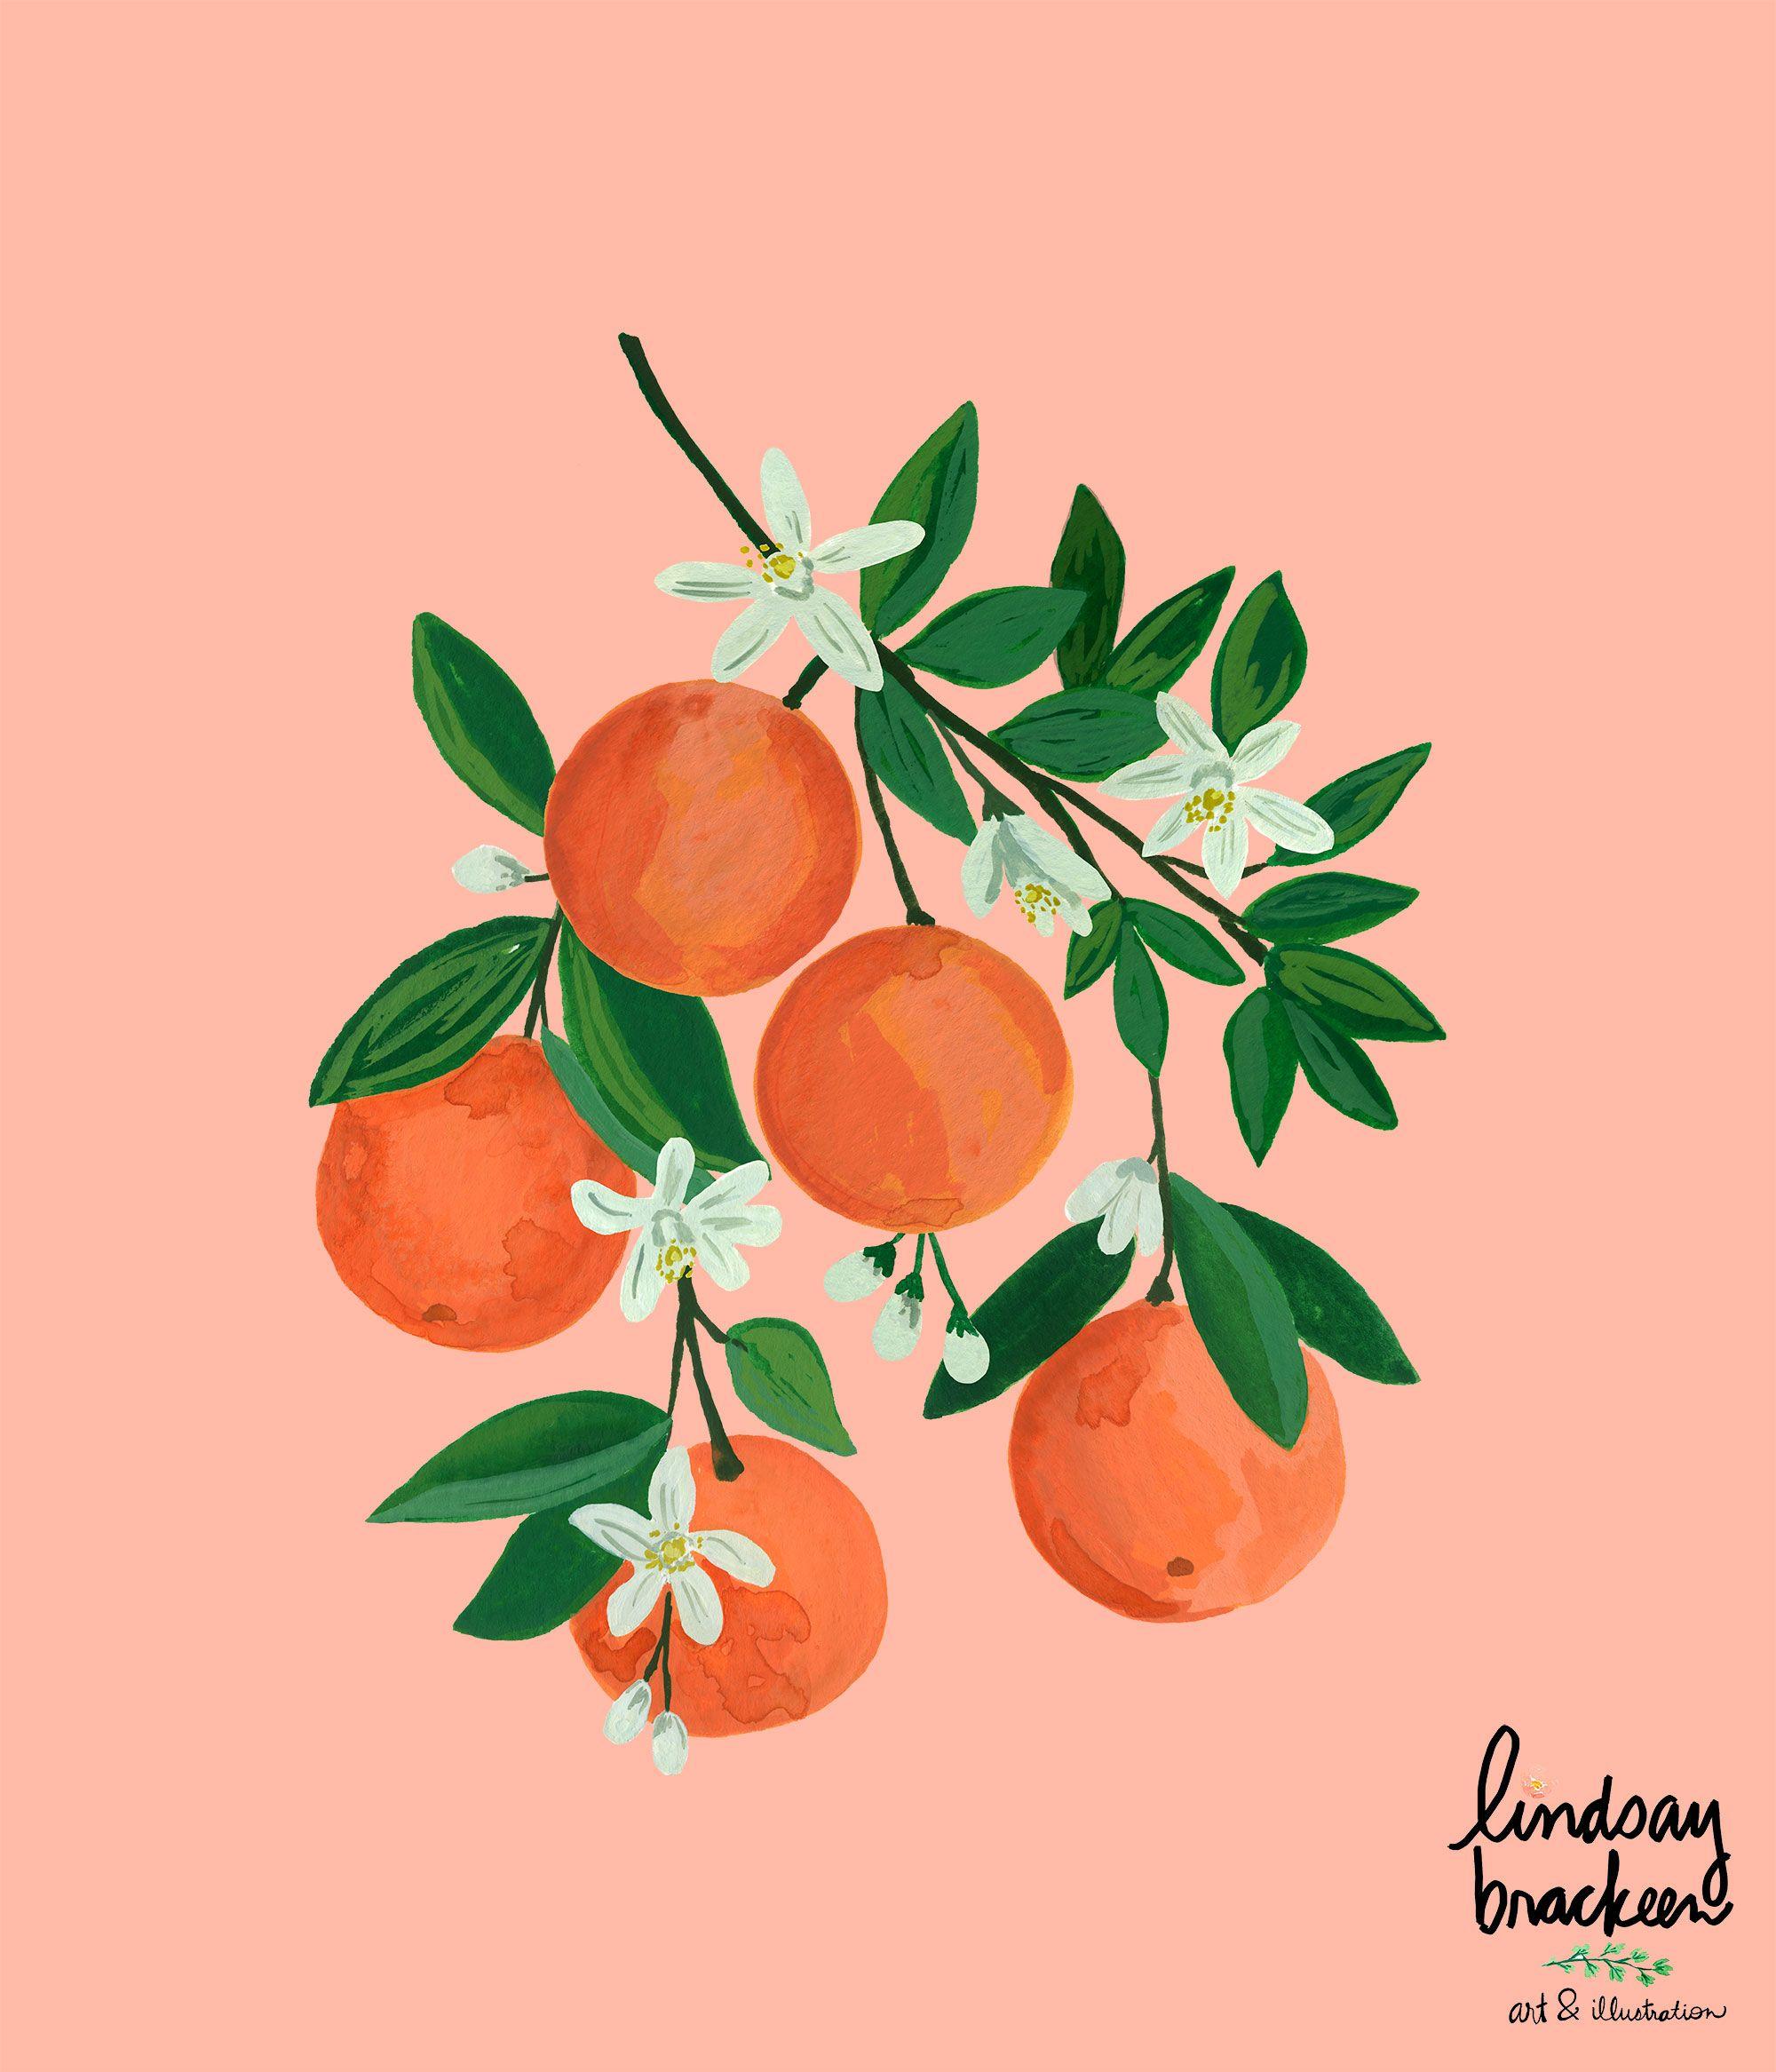 Photo of Citrus Orange Illustration by Lindsay Brackeen